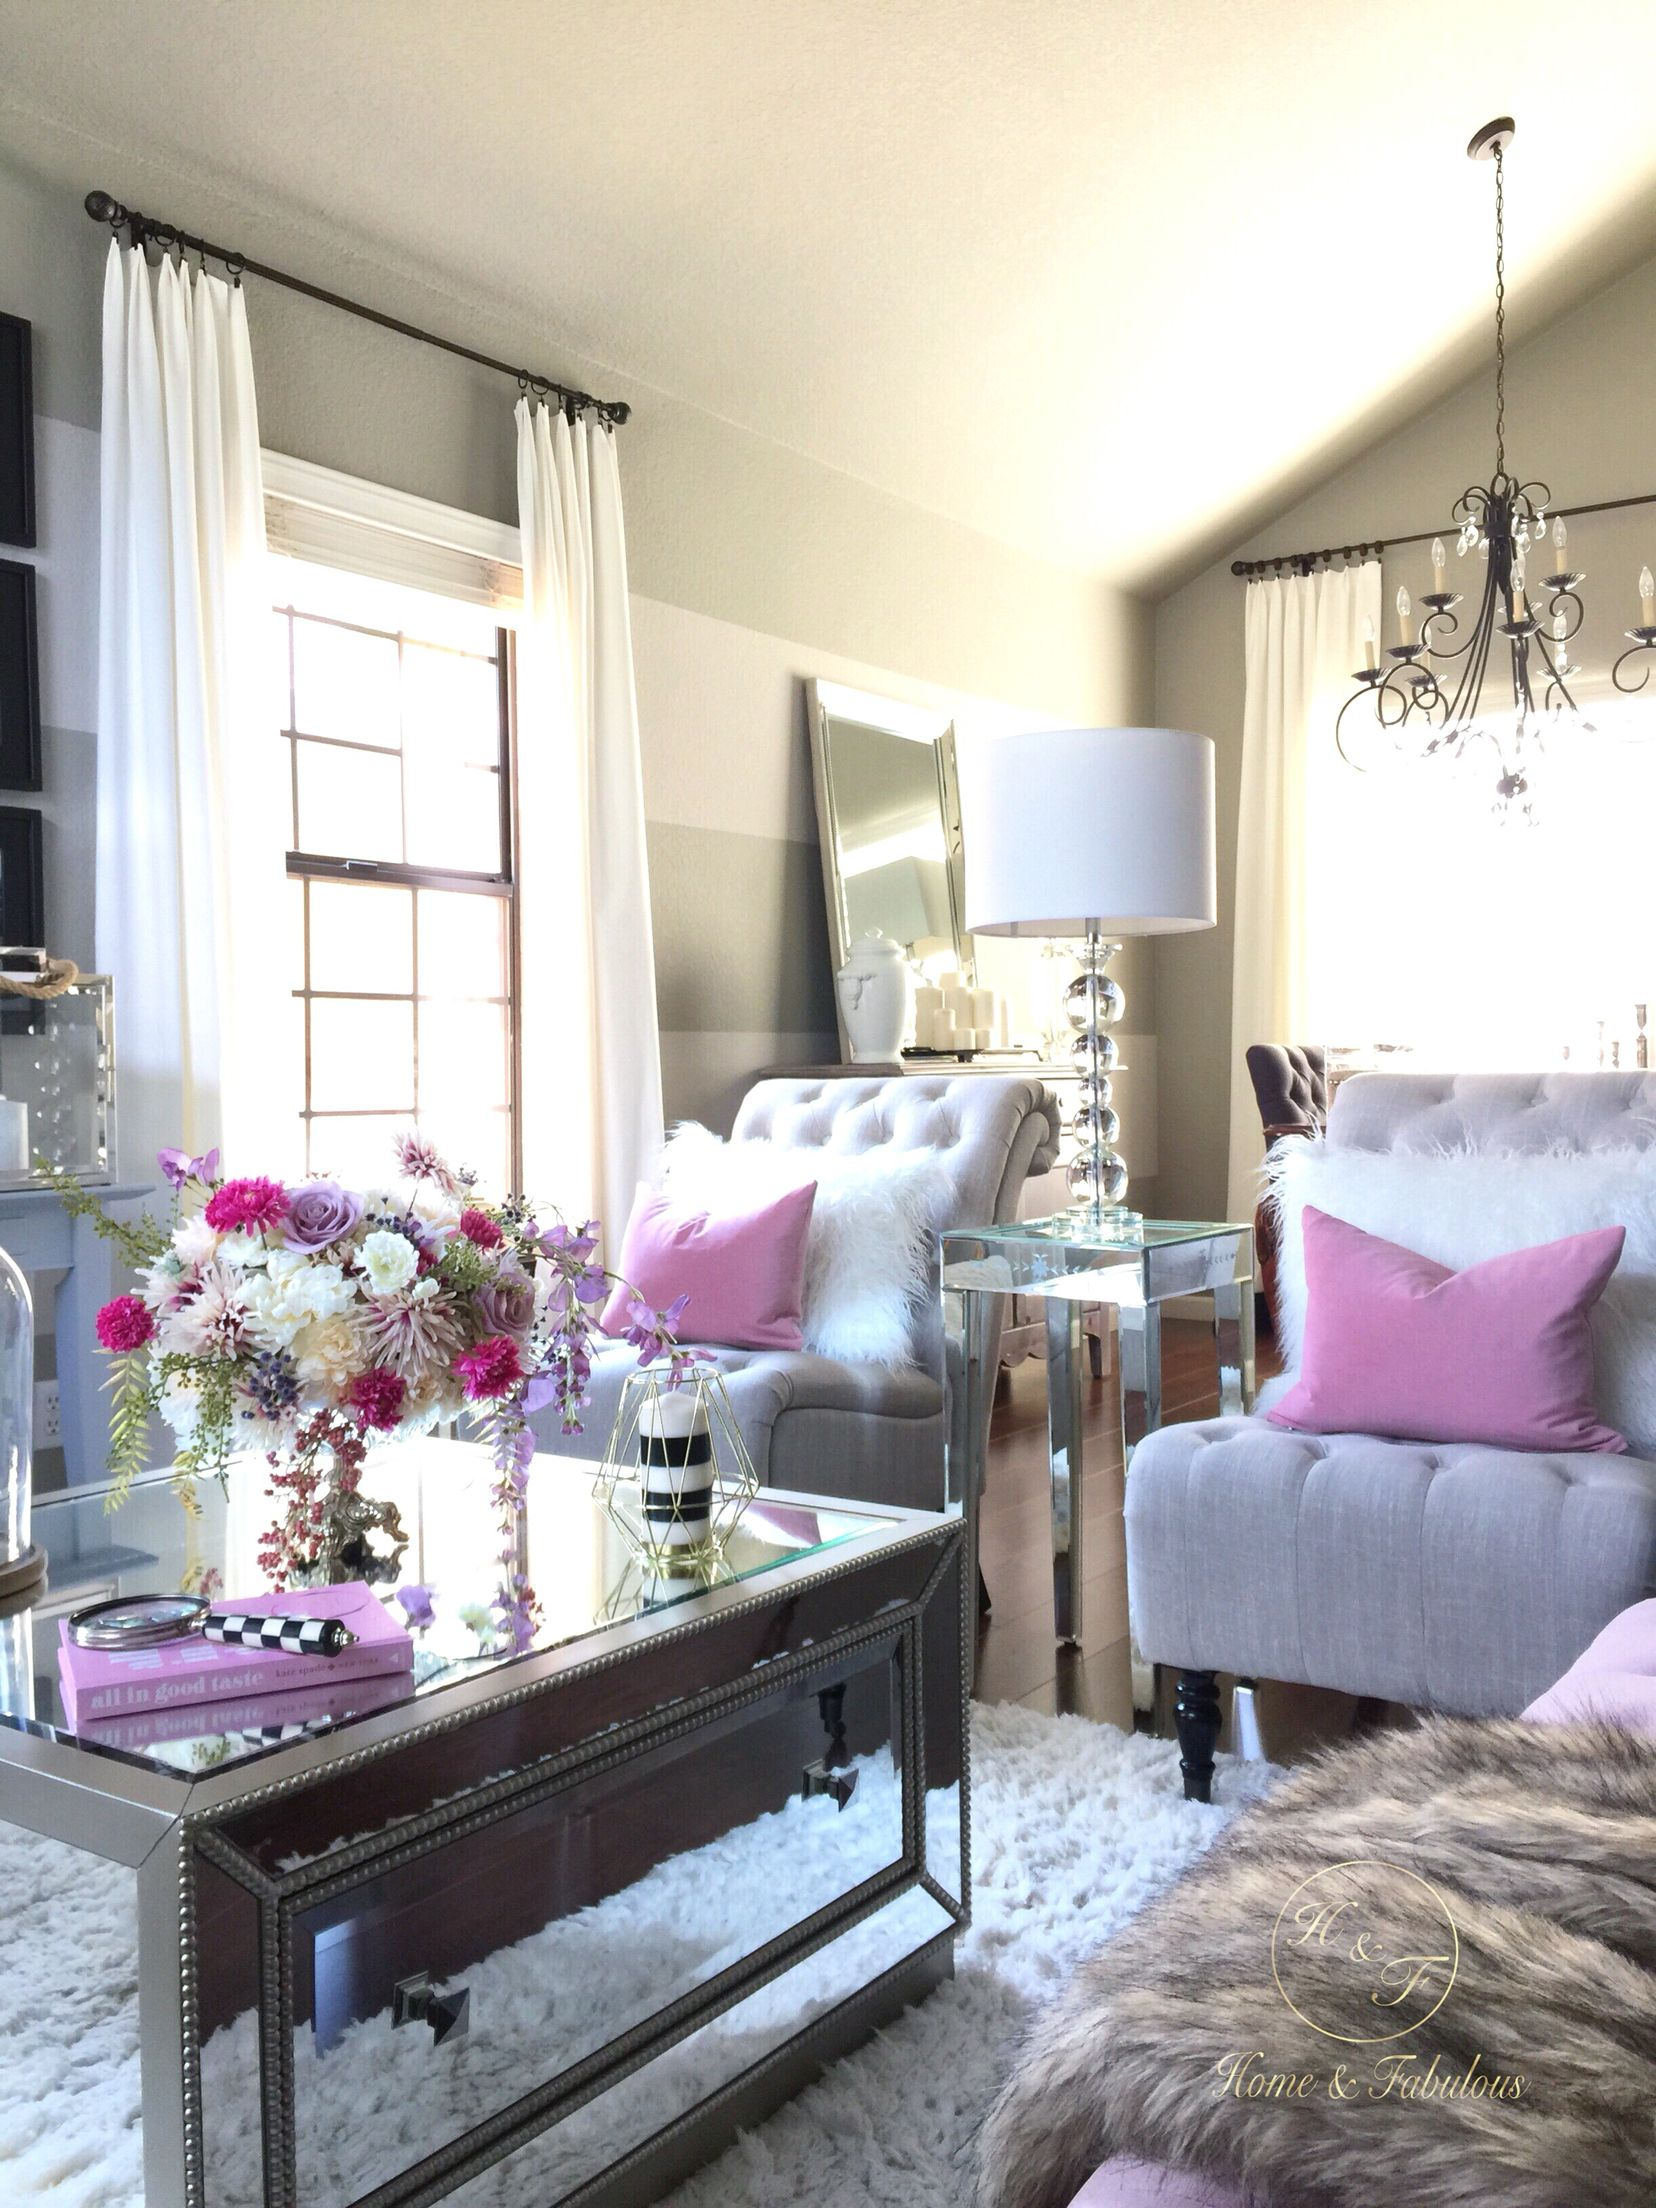 Home and Fabulous | Pink velvet pillow, Velvet pillows and Twins